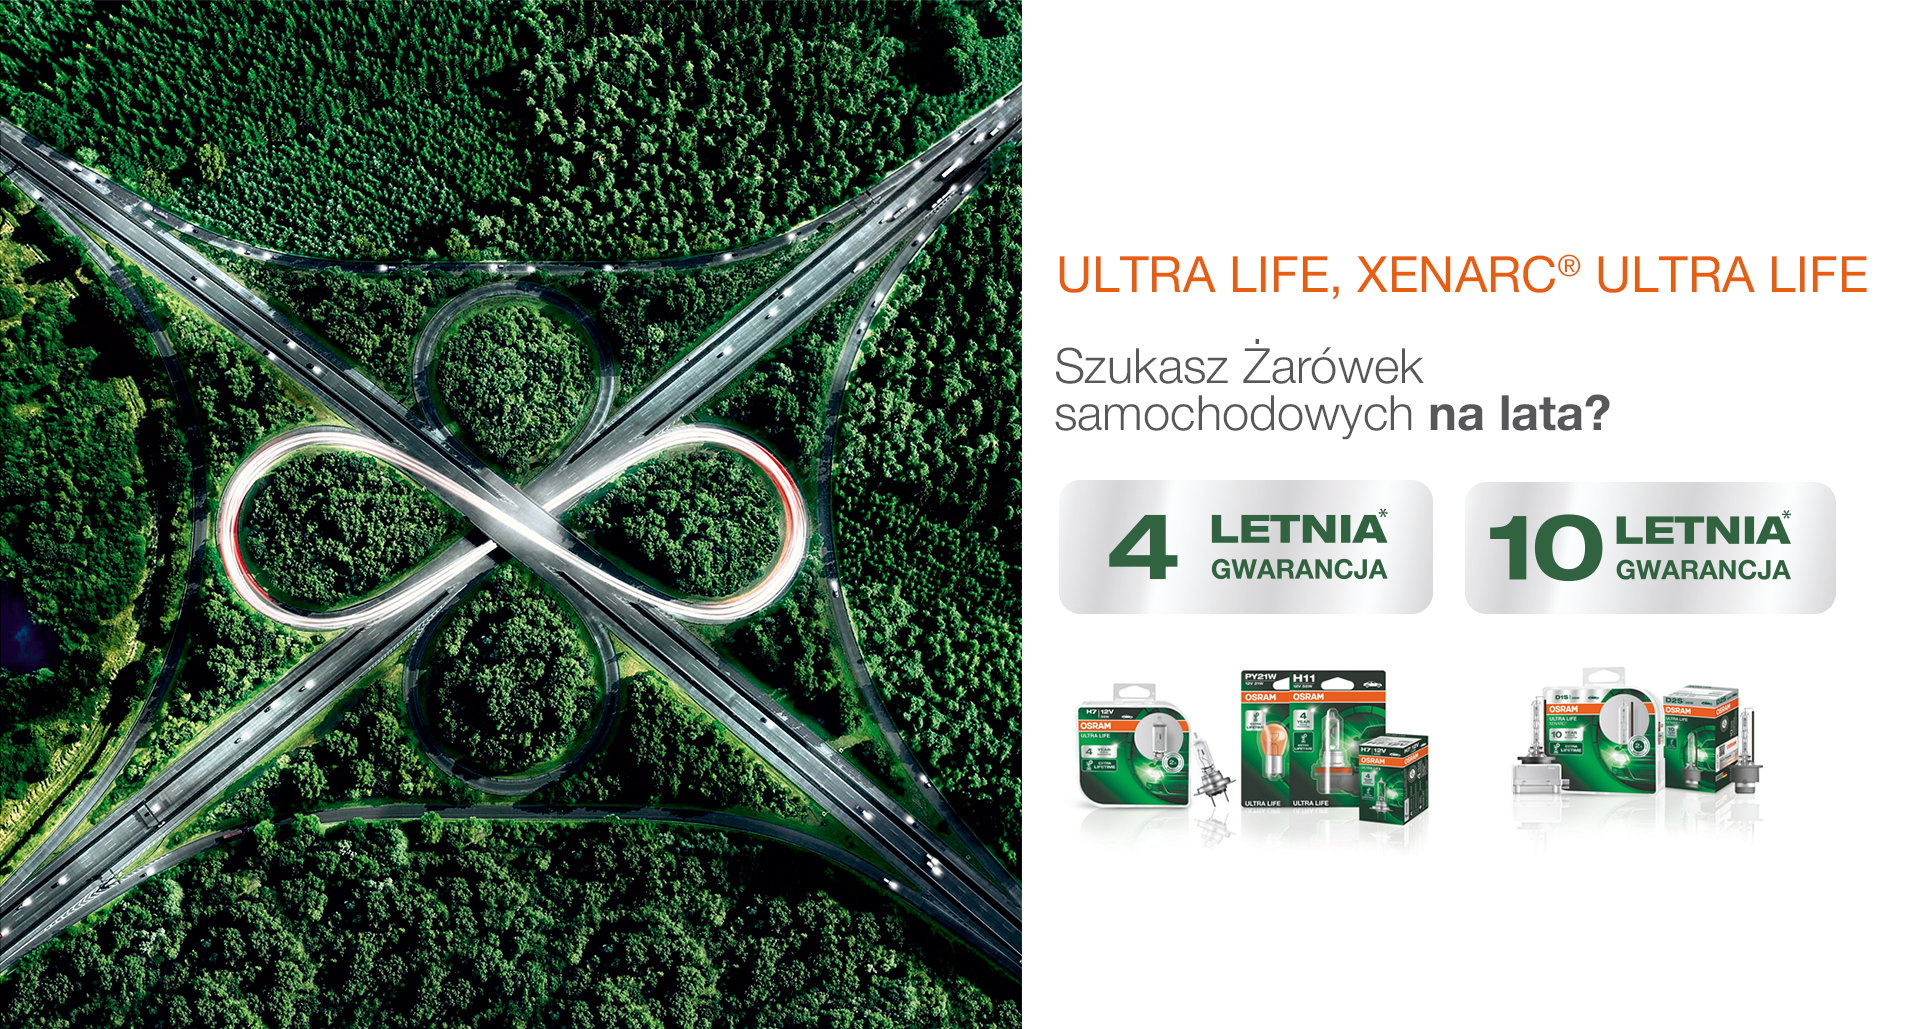 ULTRA LIFE i<br>XENARC ULTRA LIFE